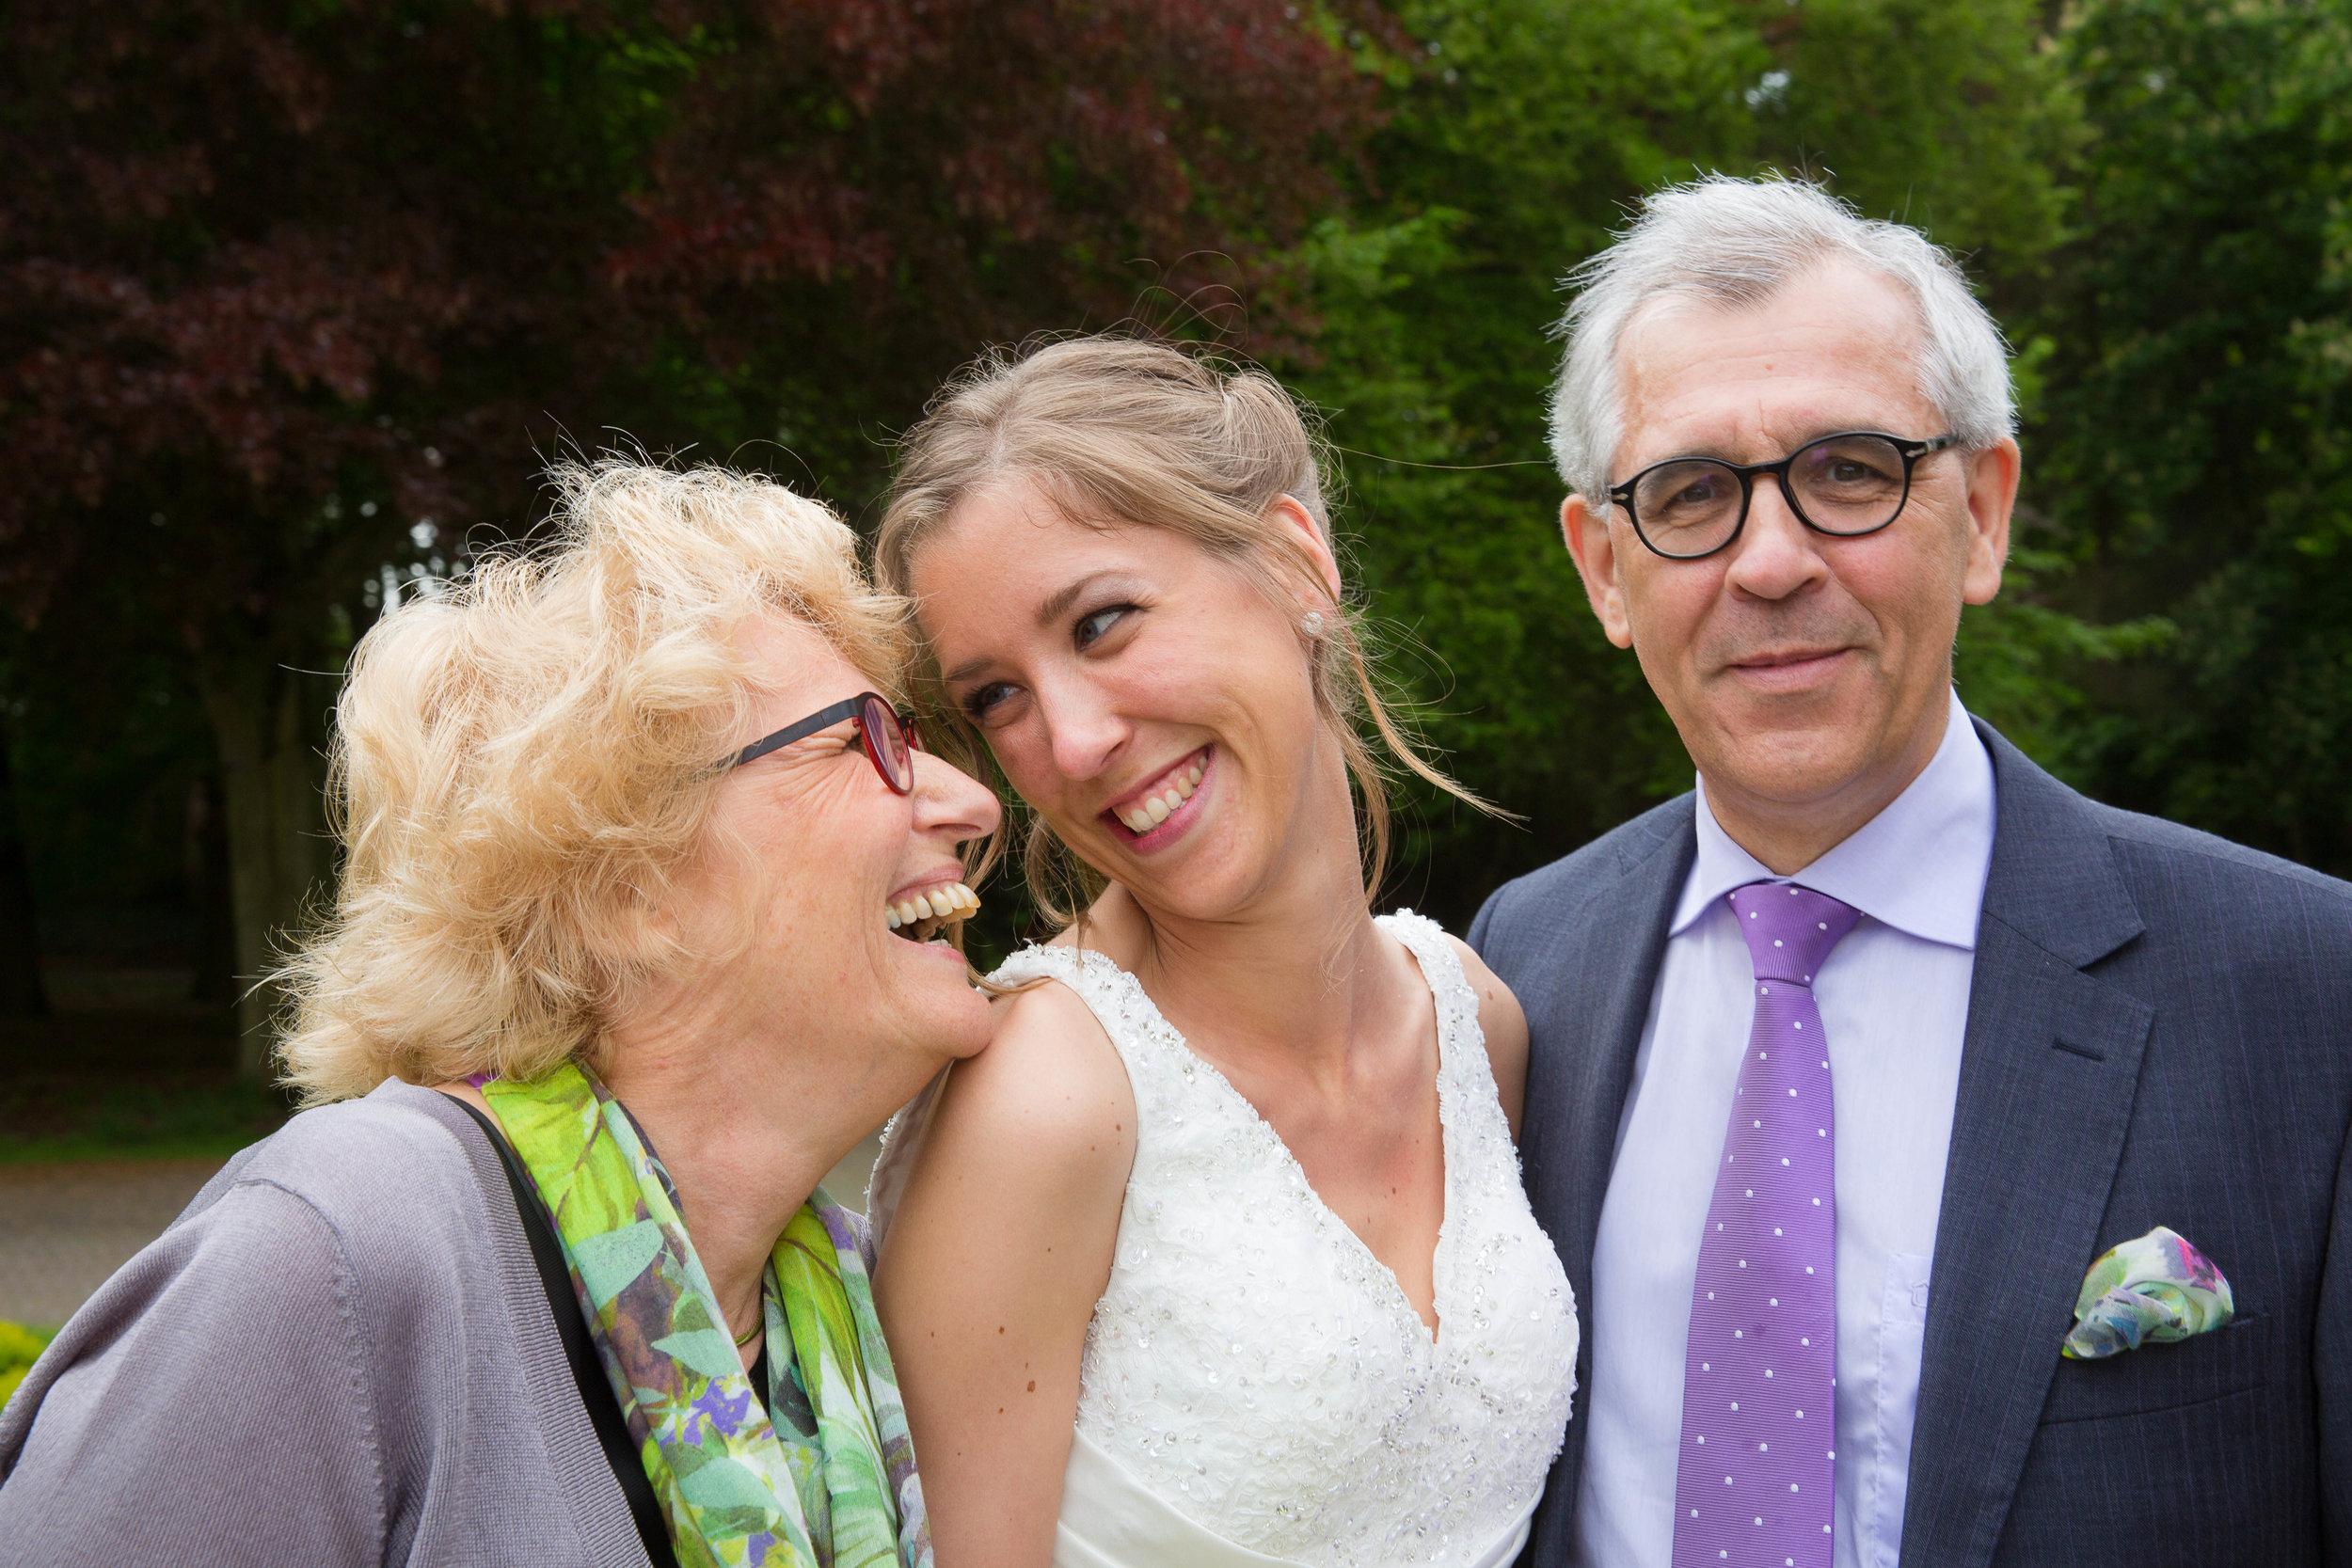 bruidsfotografie-trouwreportage-huwelijksfotografie-bruidsfotograaf-feestfotografie-Elise en Maarten-144.jpg